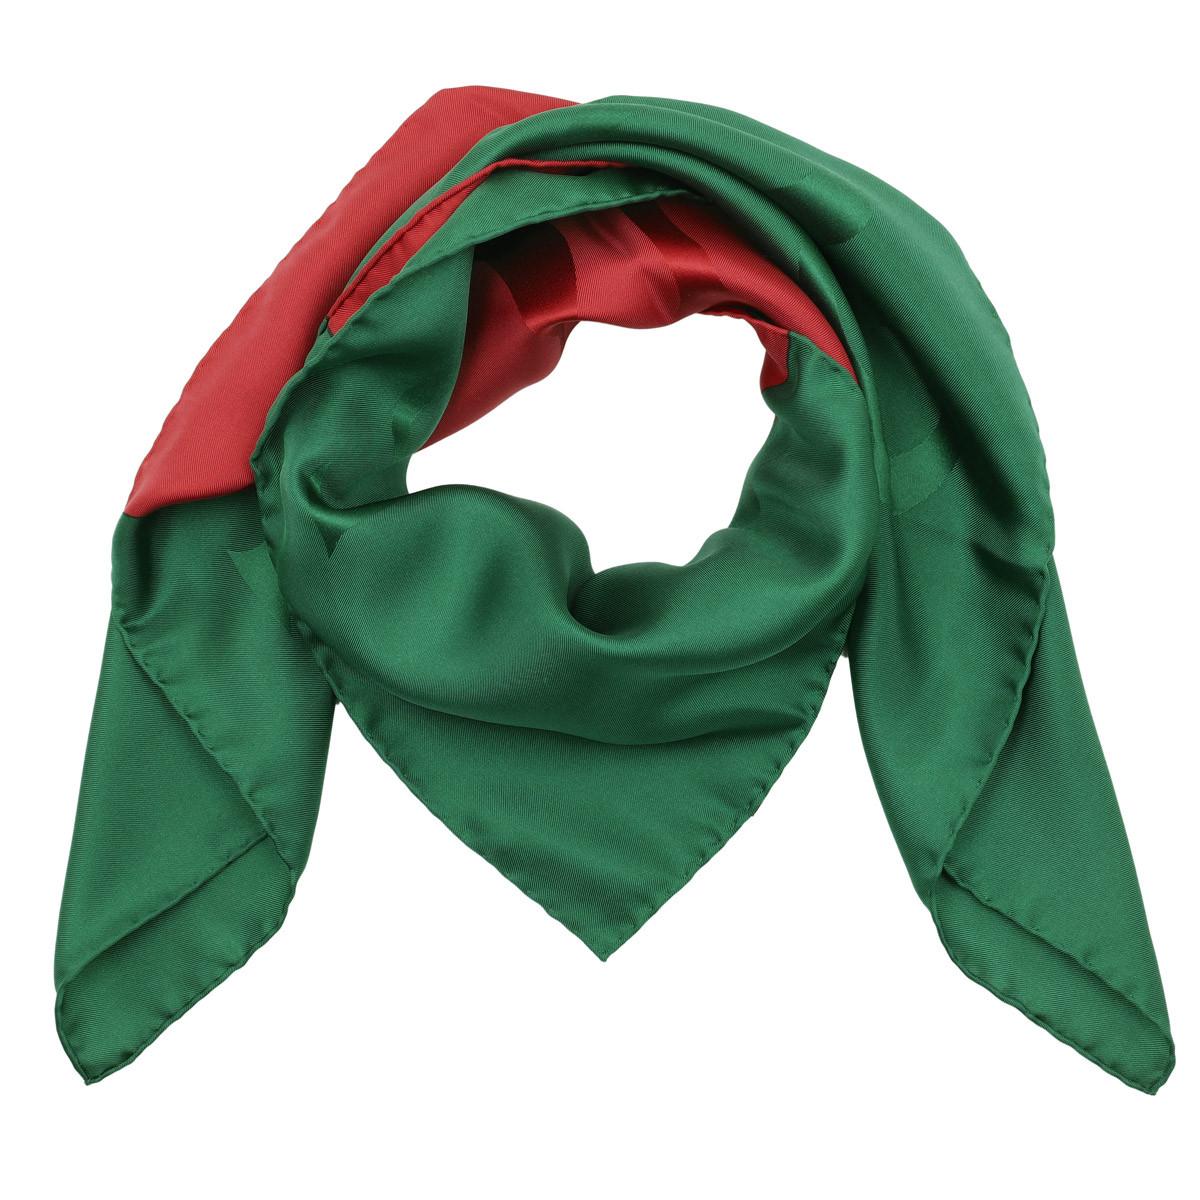 Gucci Accessoire - Web Motif Scarf Silk Green/Red - in grün - für Damen